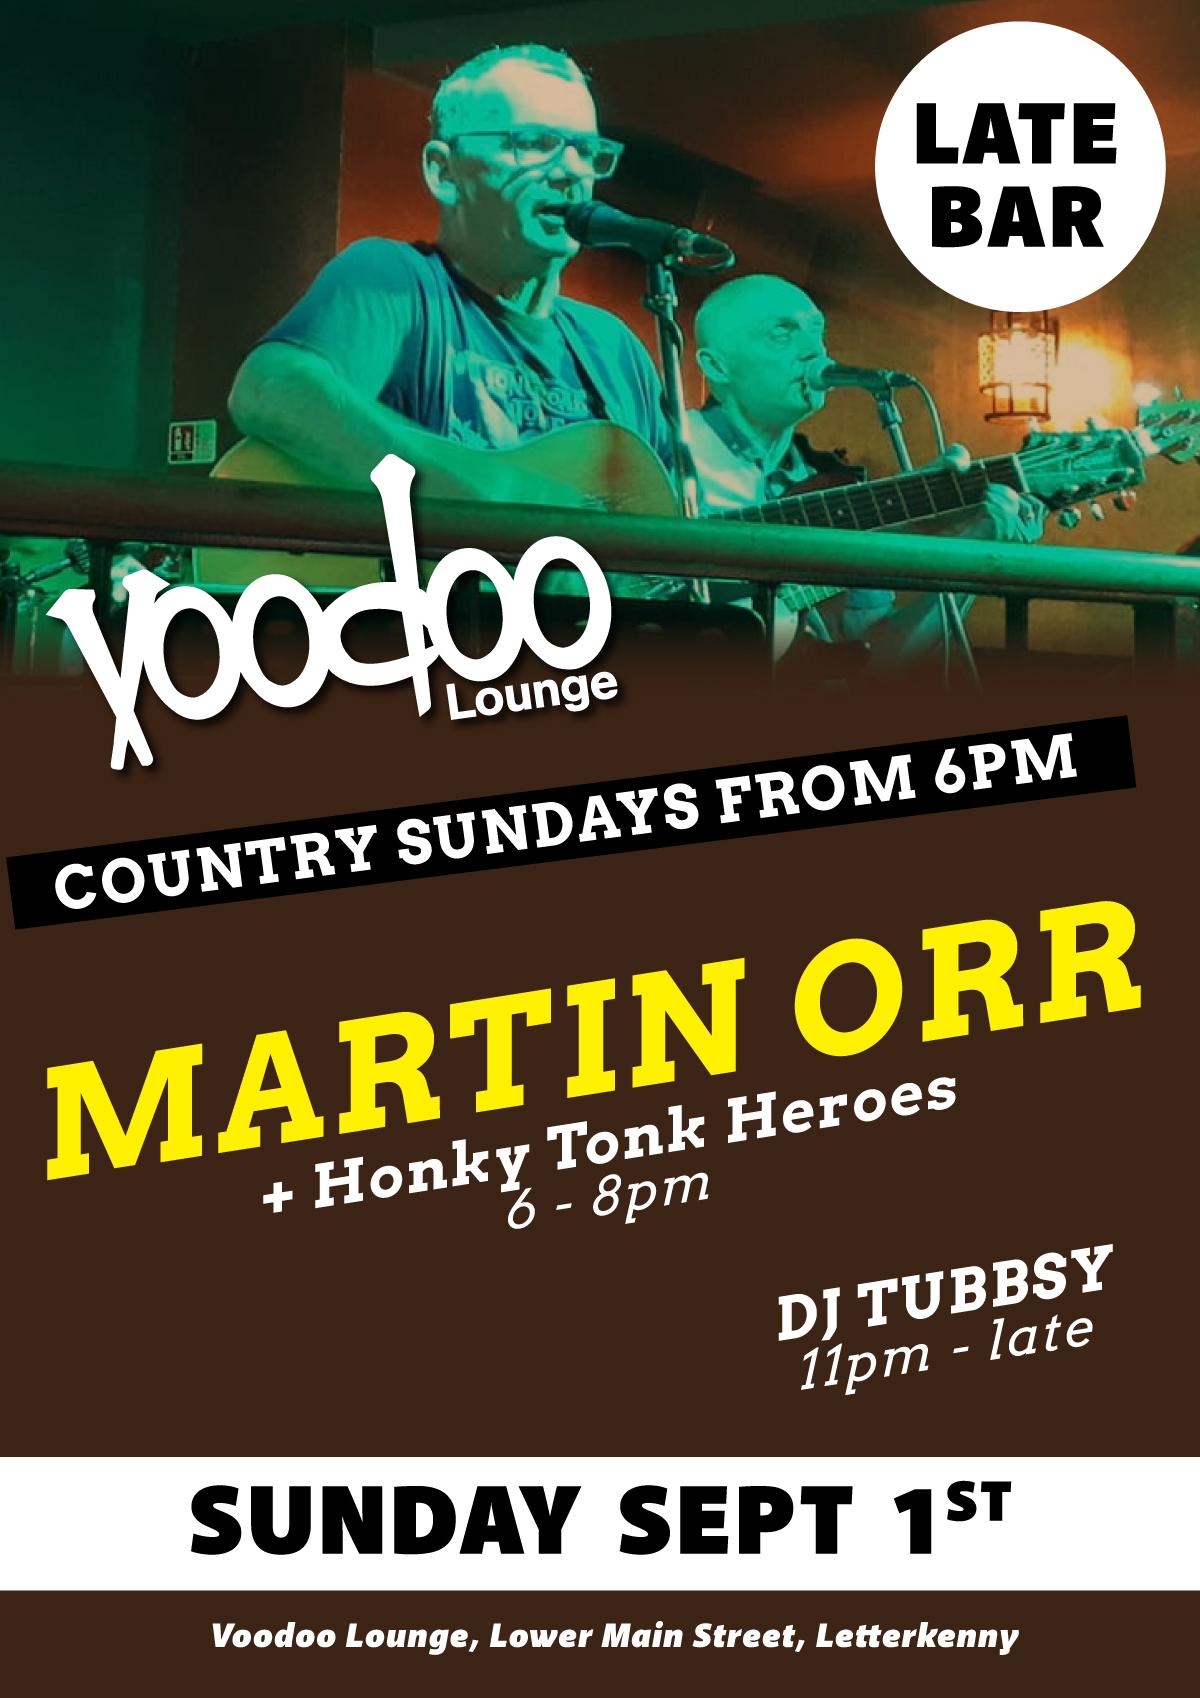 voodoo-venue---sunday---HONKY-TONK-HEROES-martin-orr---sun-sept-1-2019.jpg